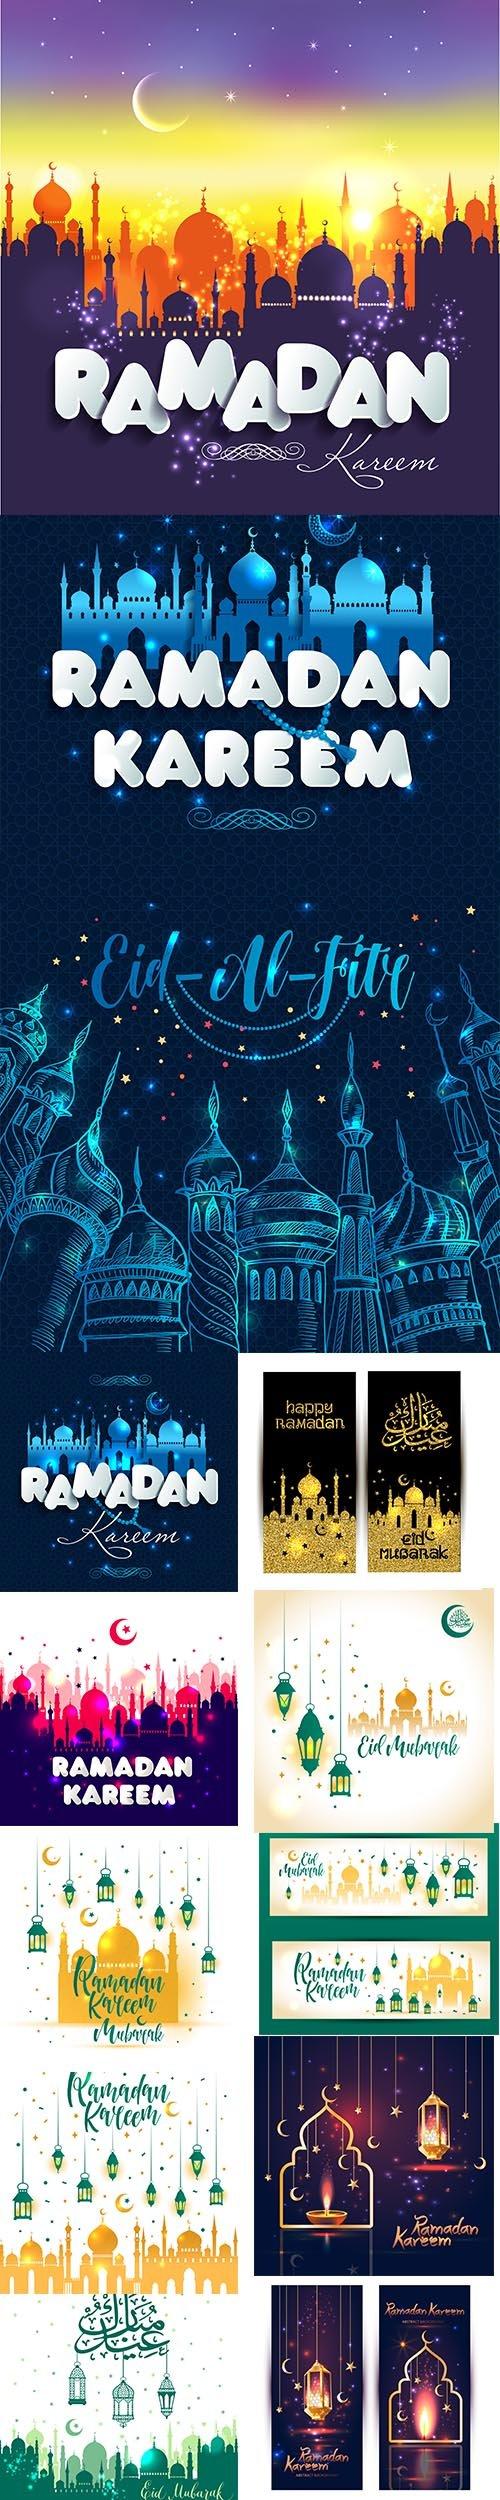 Ramadan Kareem Abstract Islamic Illustrations